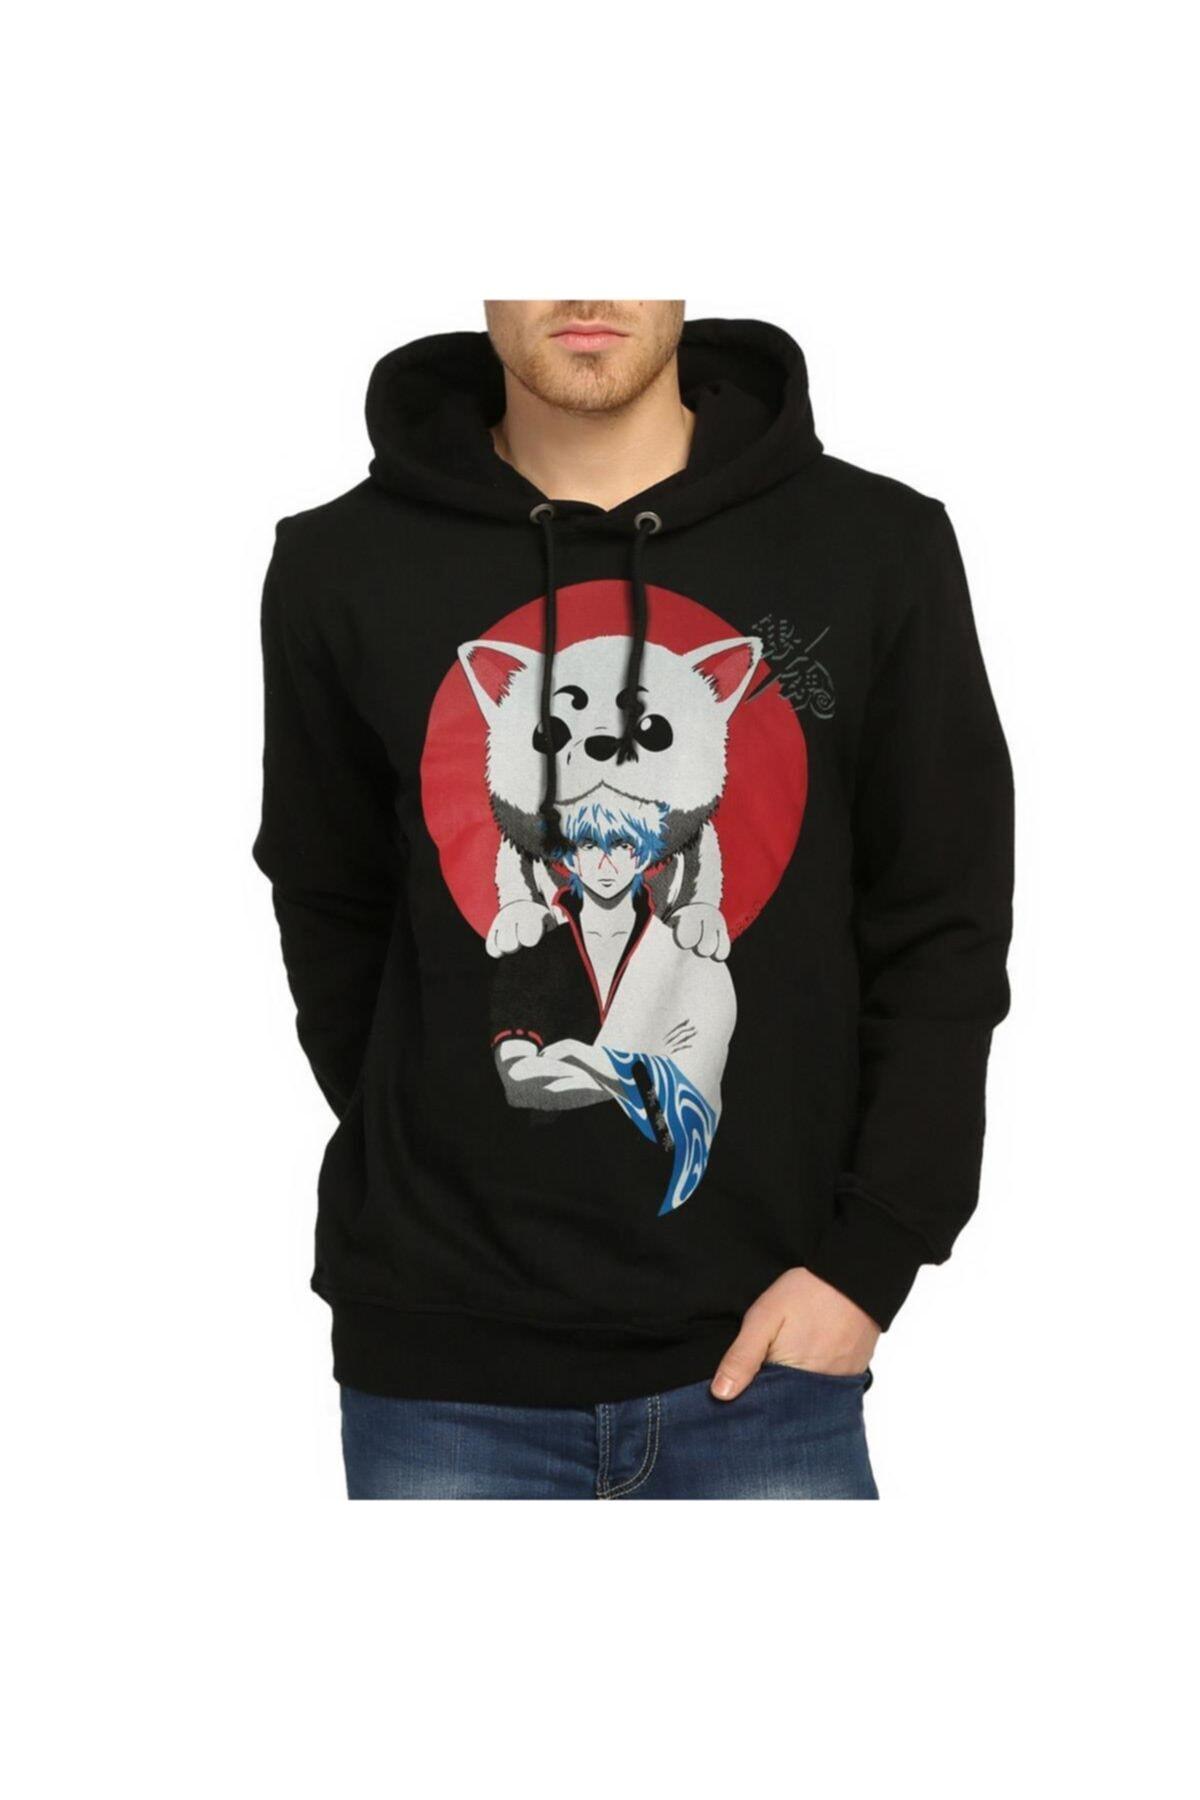 Bant Giyim - Gintama Siyah Kapüşonlu Sweatshirt 1